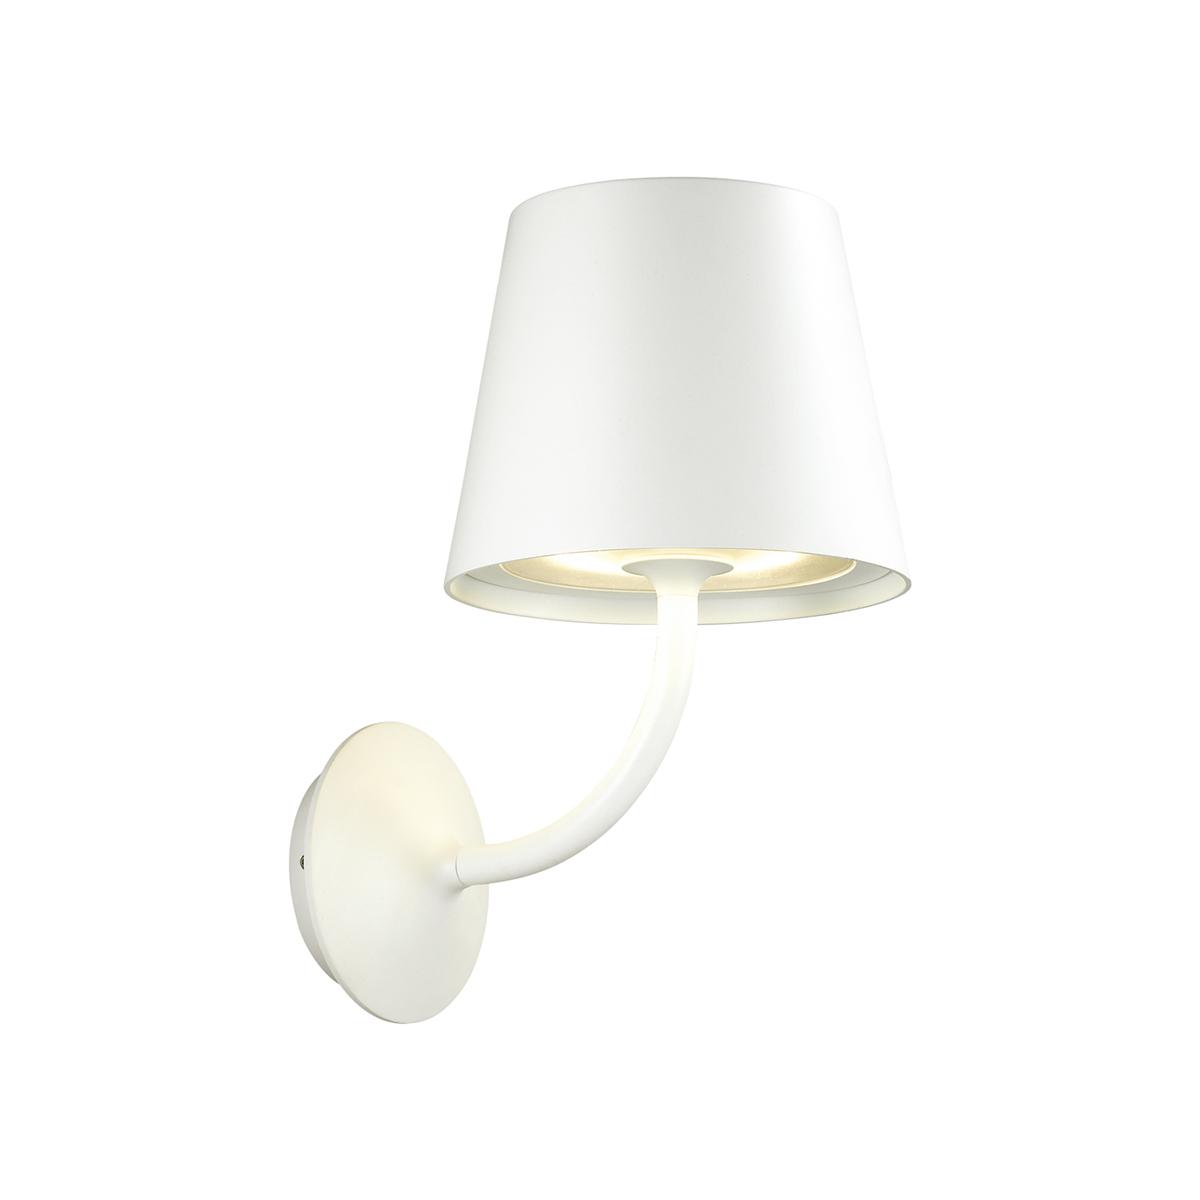 Светодиодное бра Odeon Light Elin 4609/7WL, IP65, LED 7W 3000K 555lm, белый, металл, стекло - фото 1